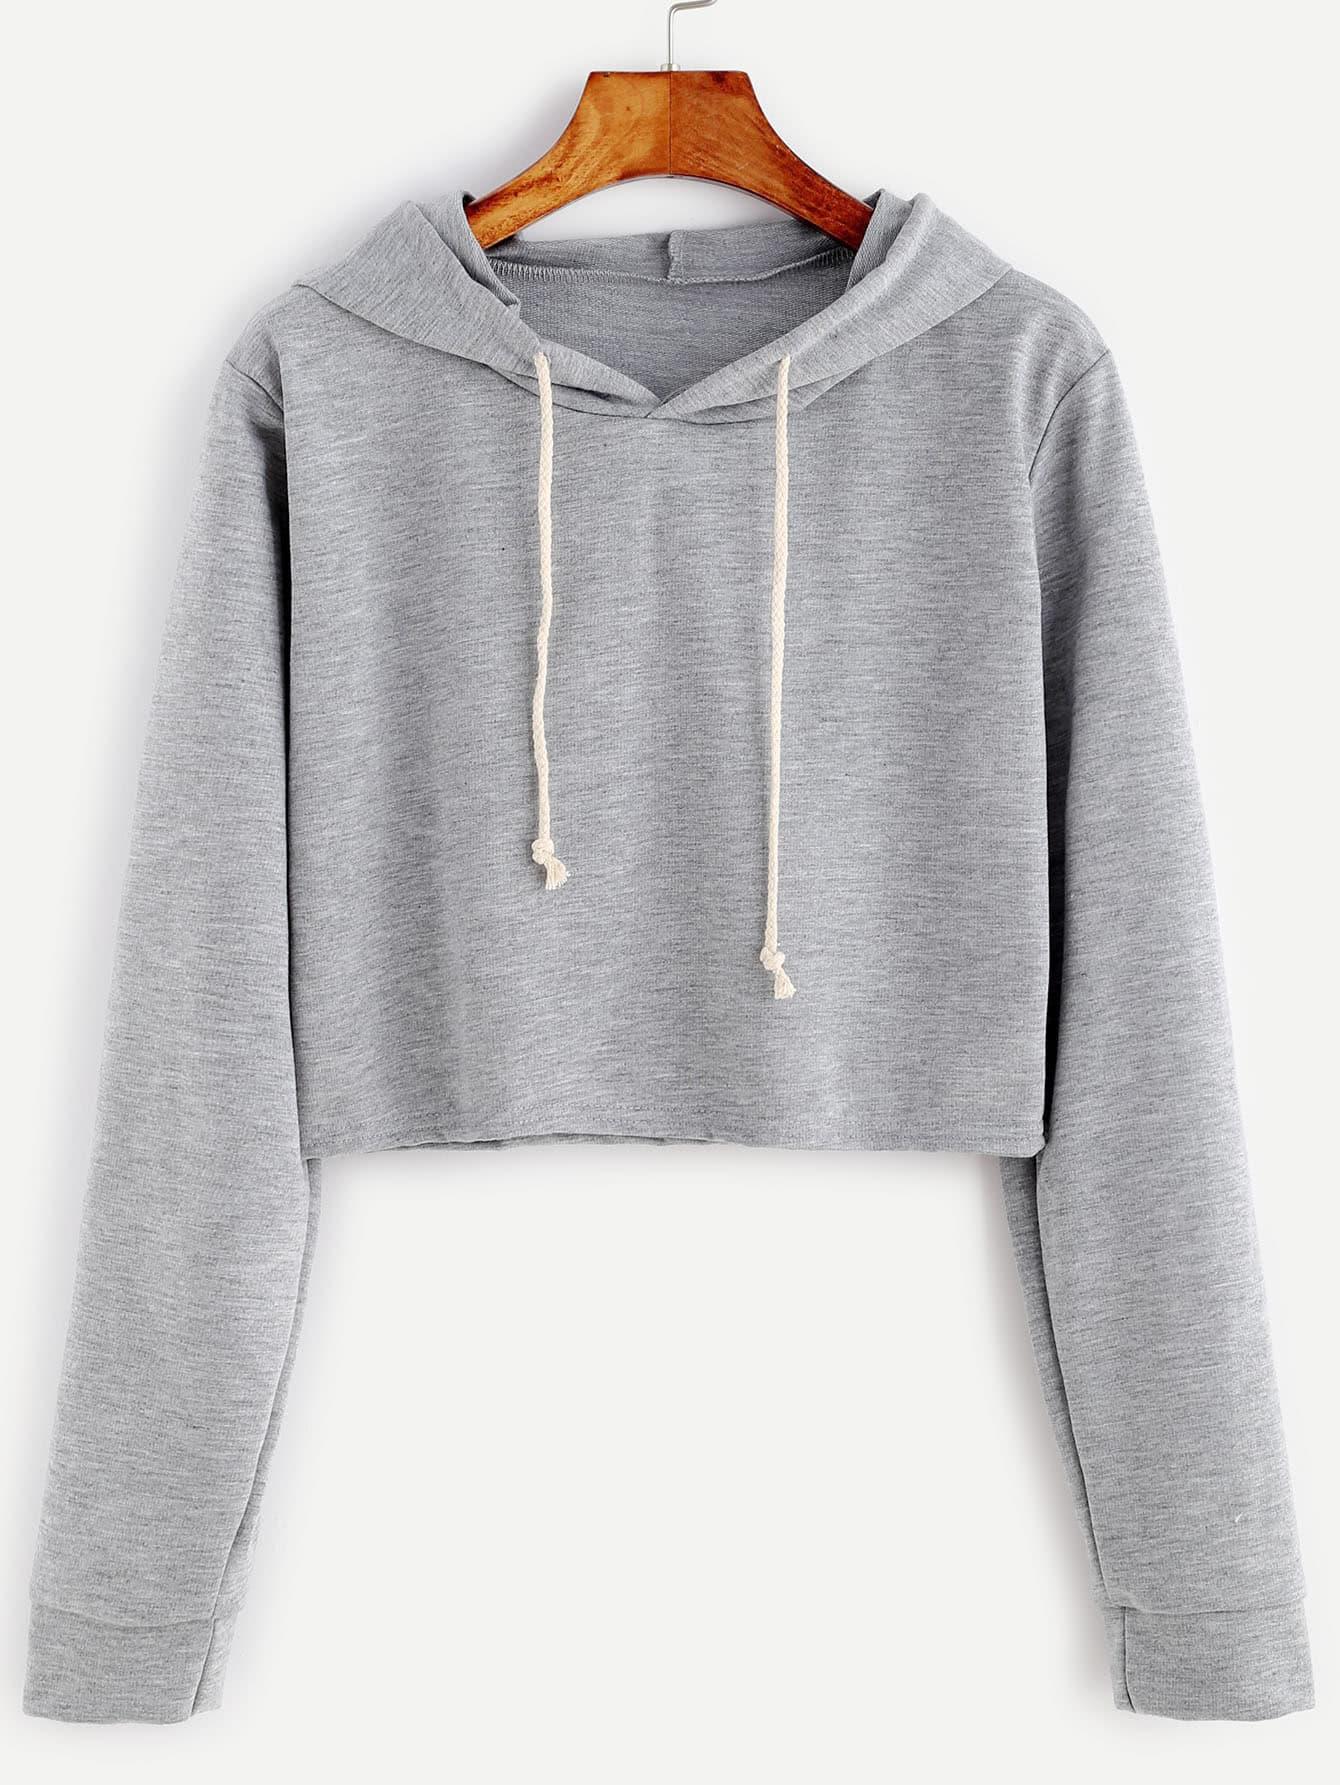 Cat Christmas Sweatshirt